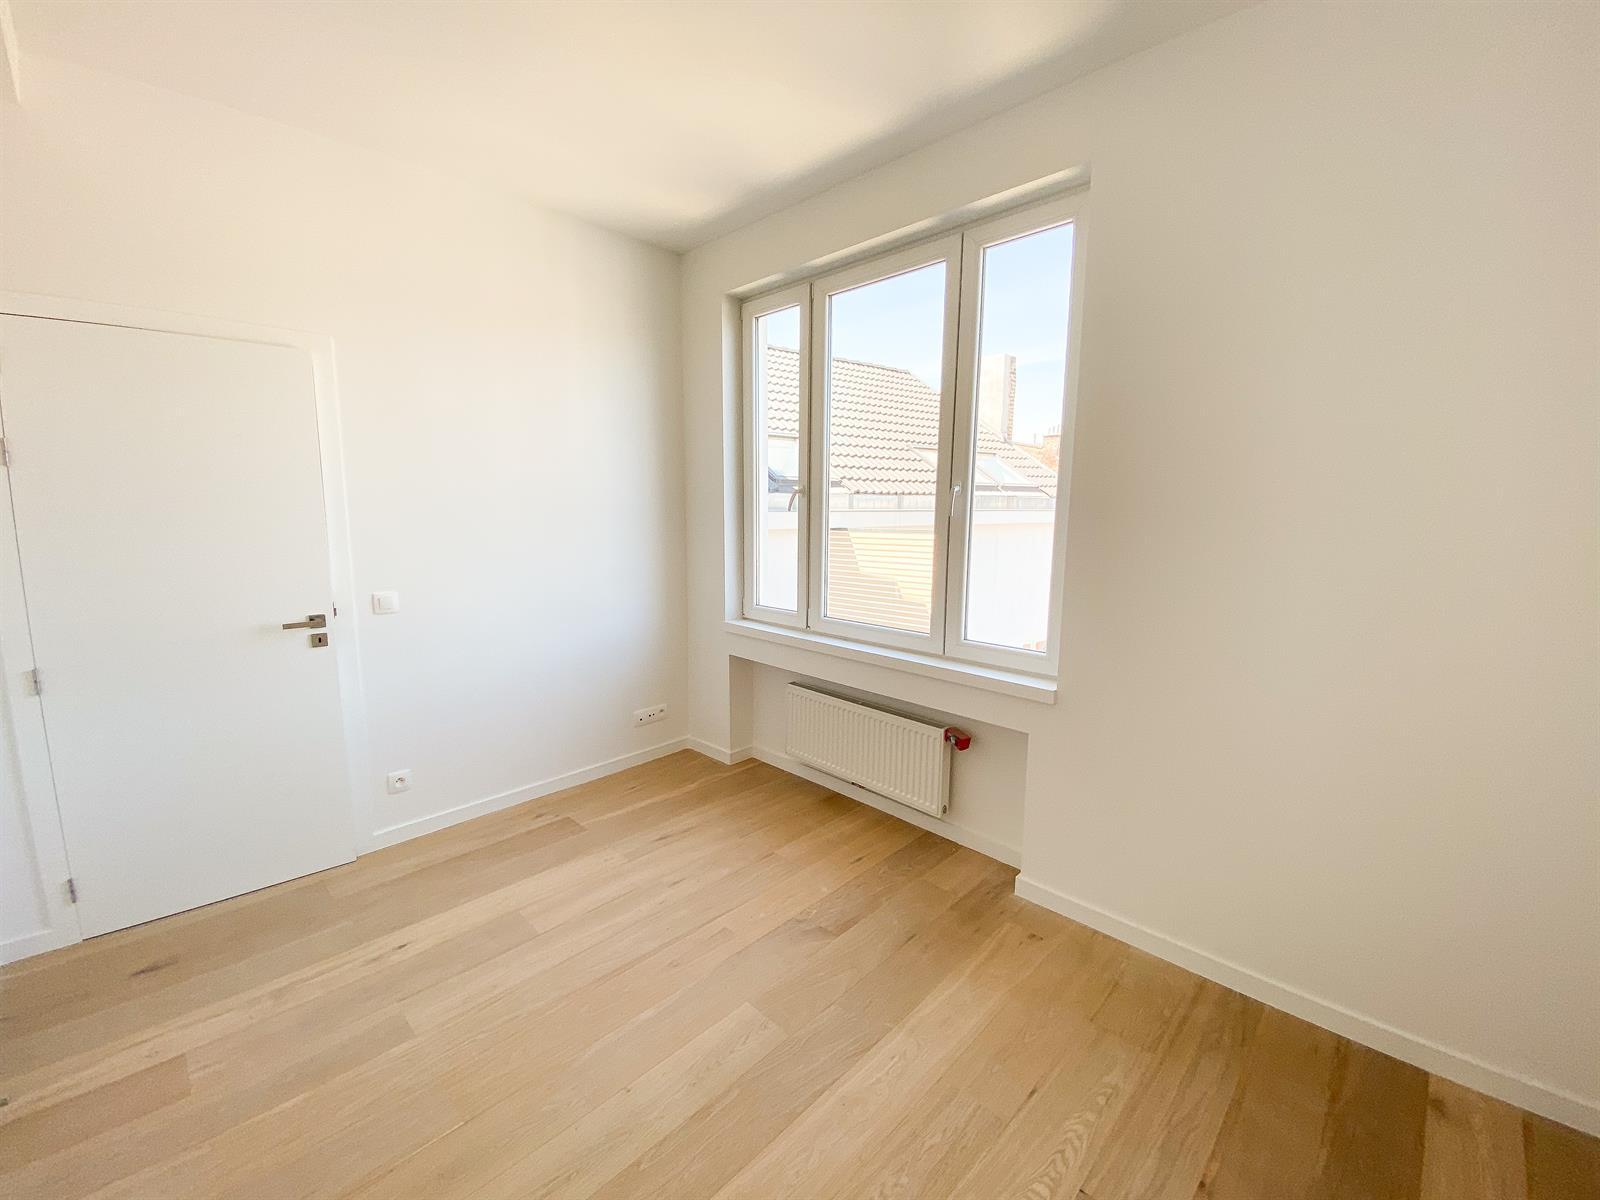 Appartement - Liège - #4045803-11